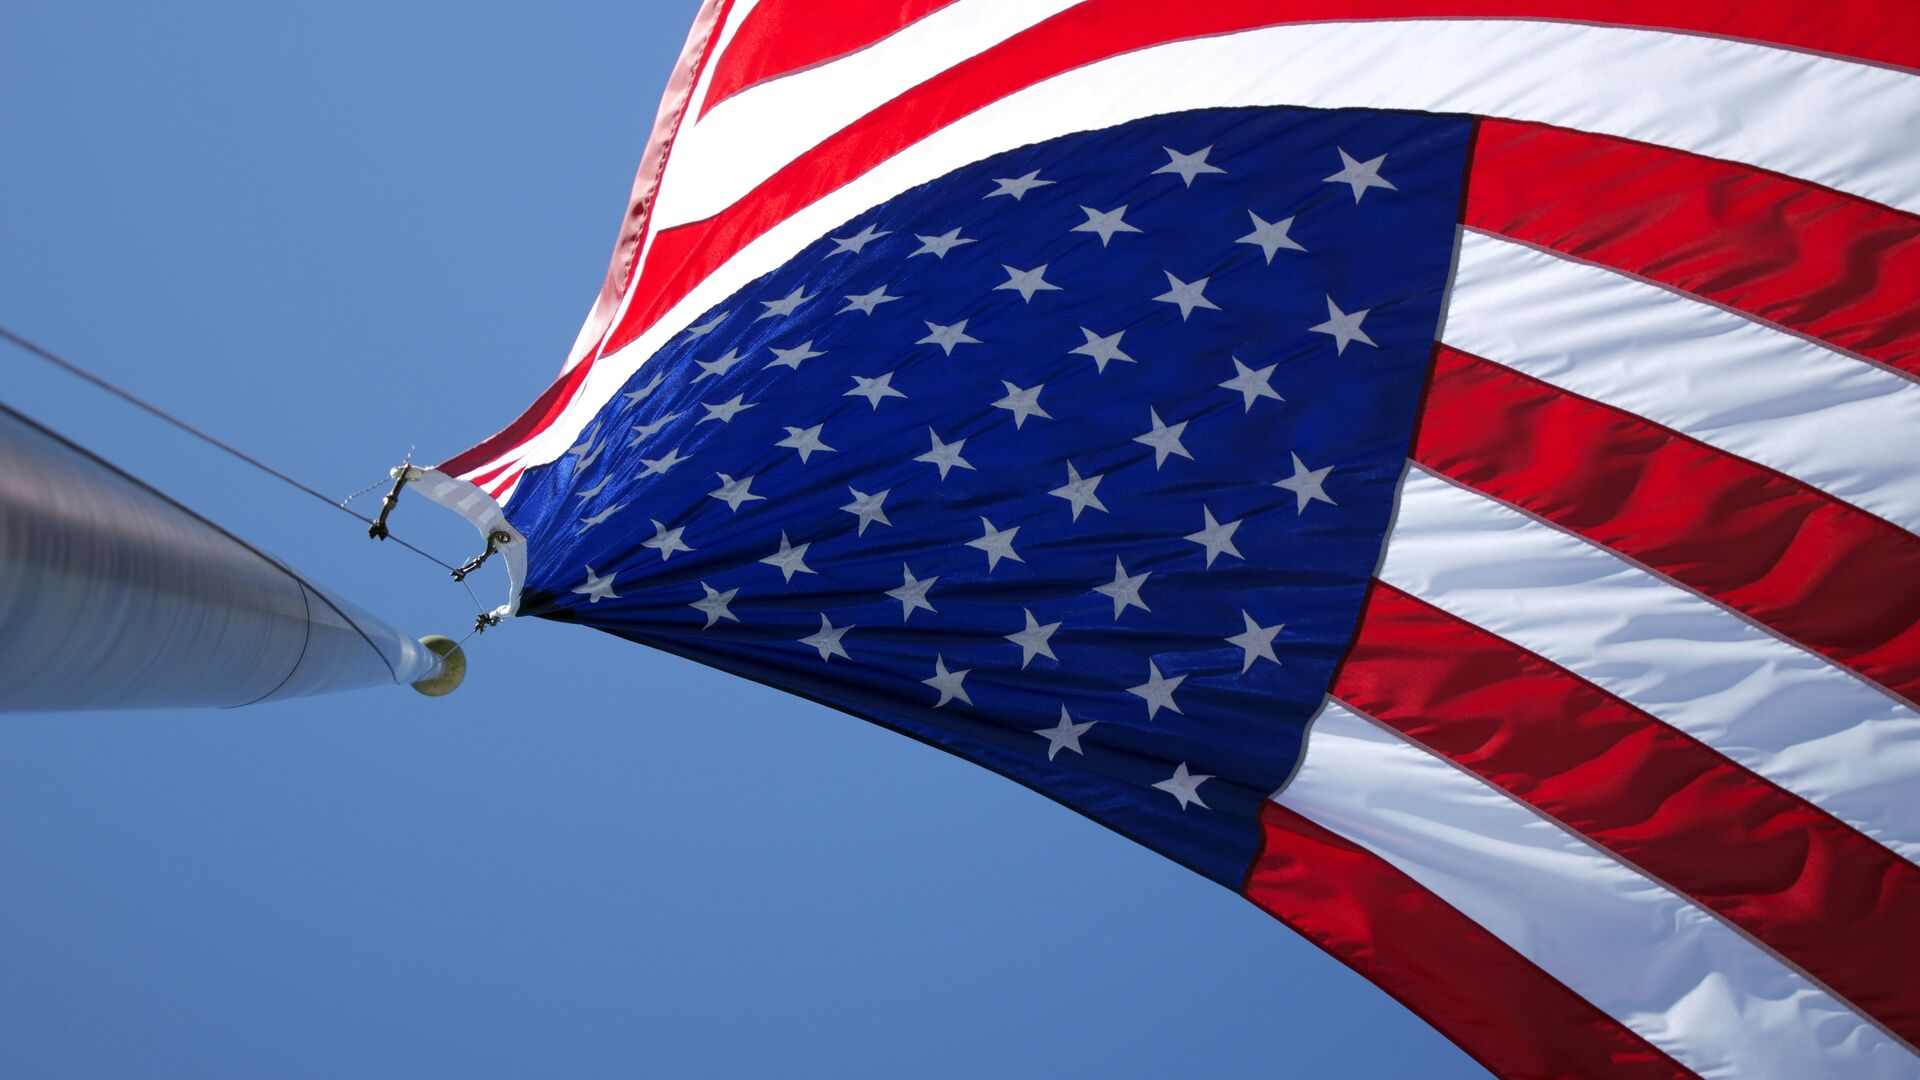 La bandera de EEUU - Sputnik Mundo, 1920, 24.03.2021